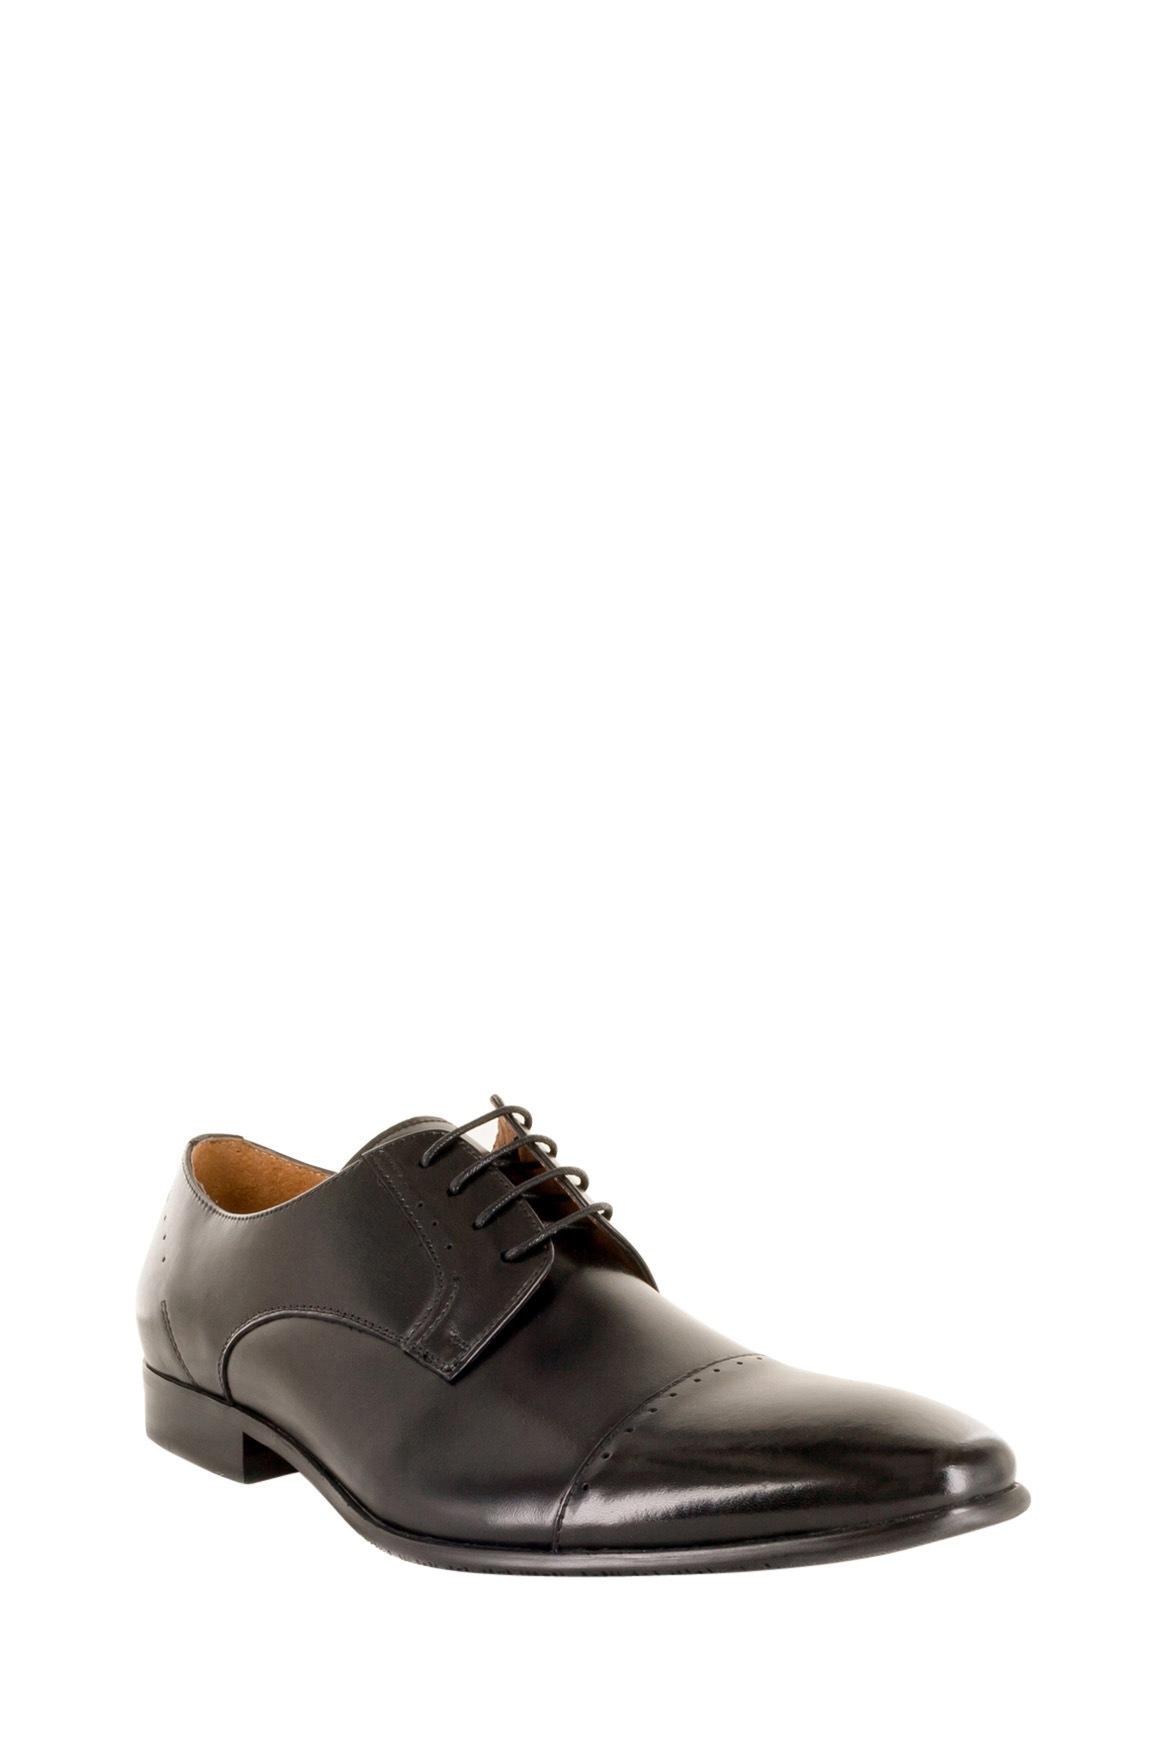 Myer Mens Dress Shoes